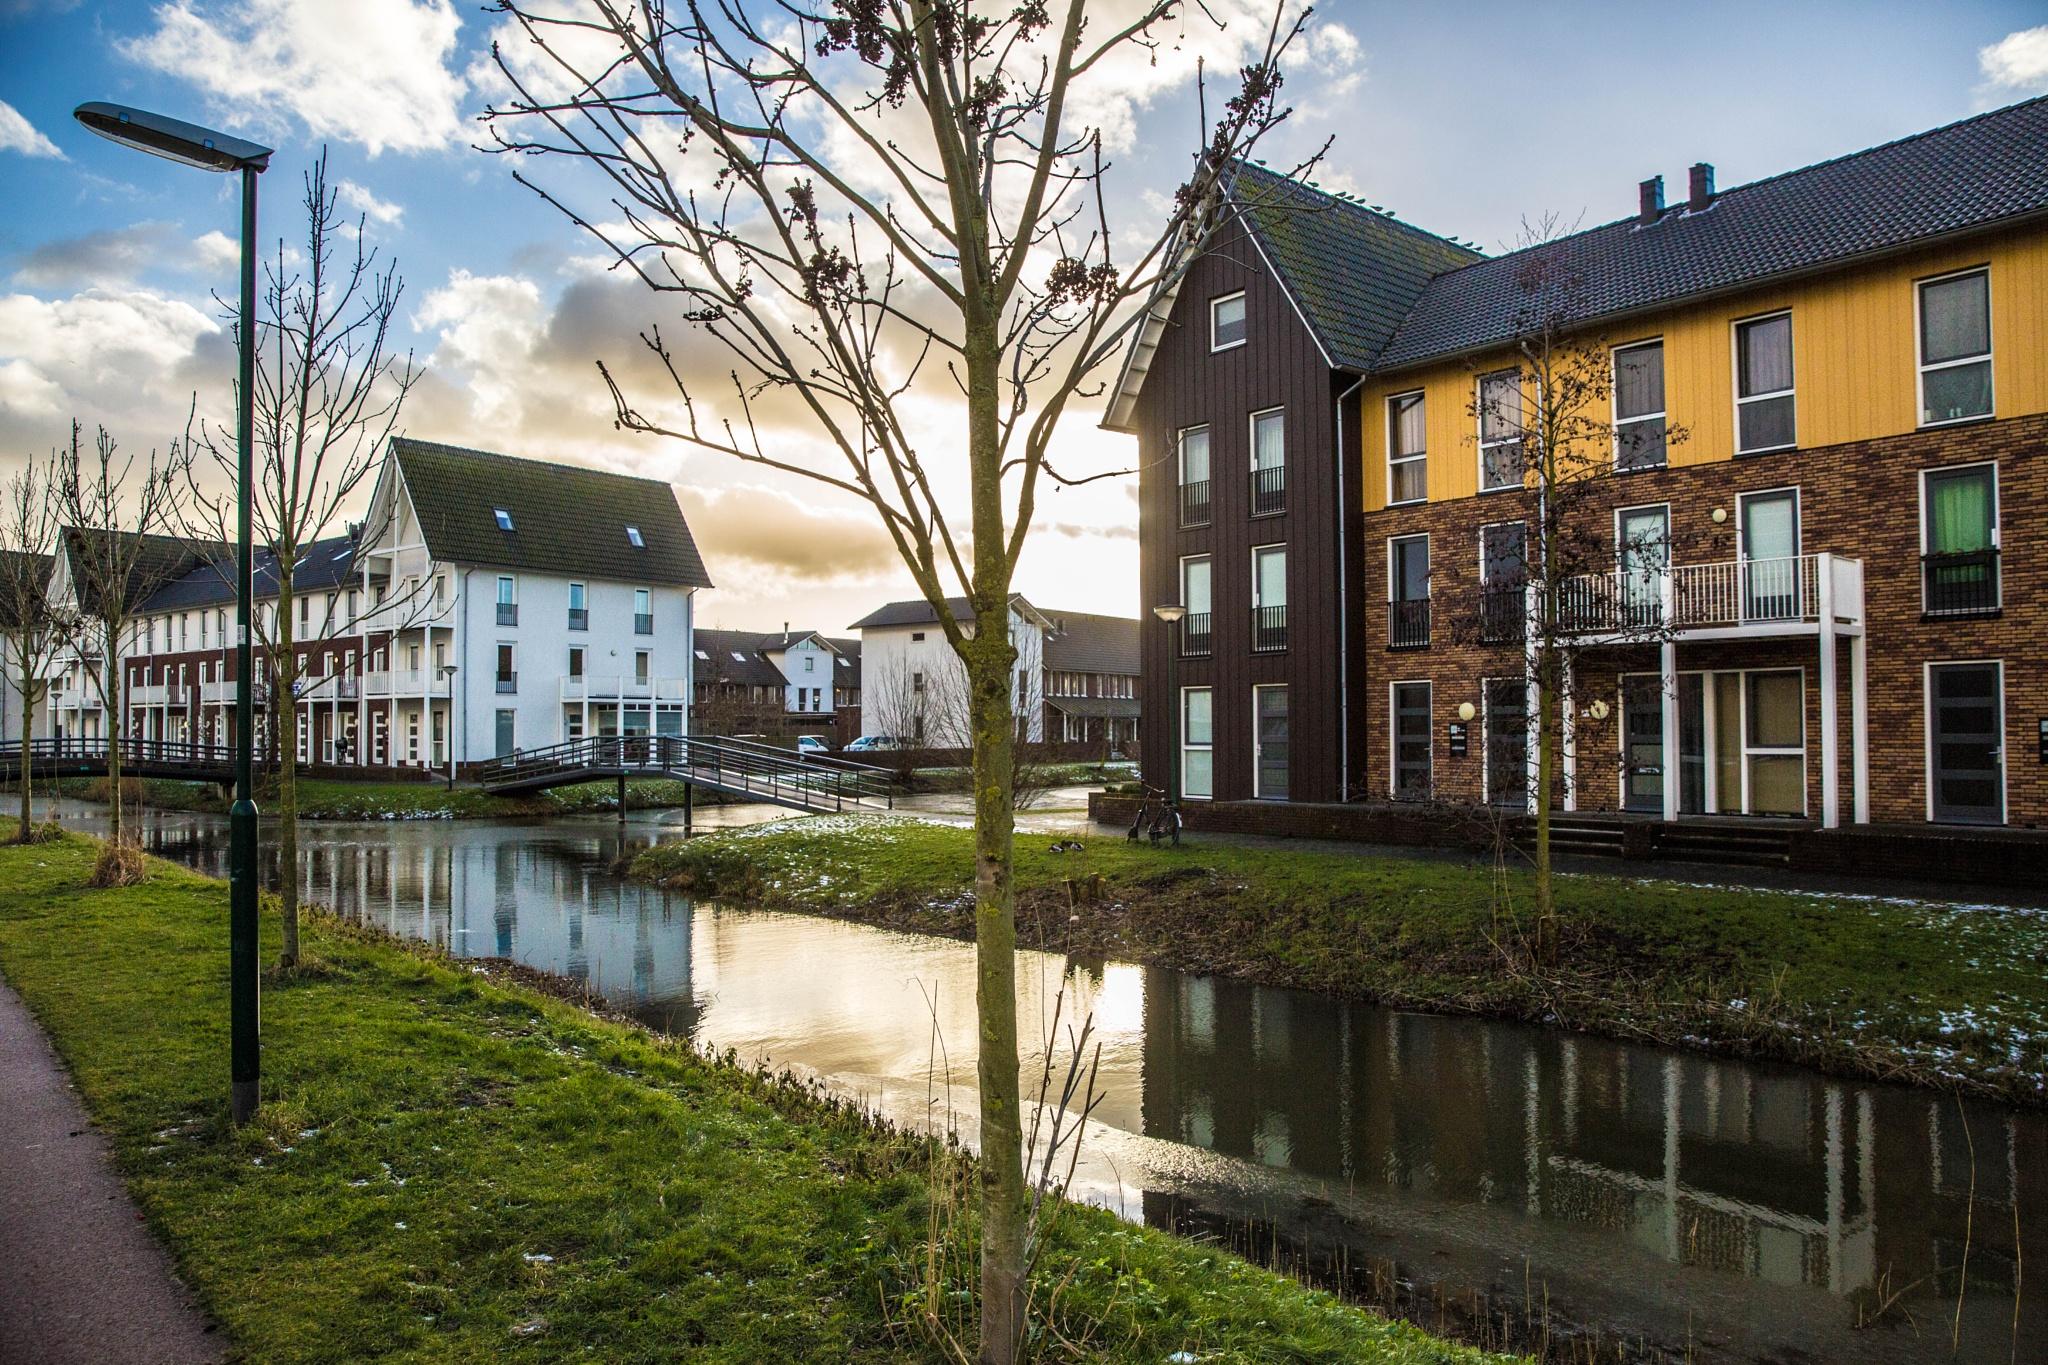 Houten, Utrecht by daniel35